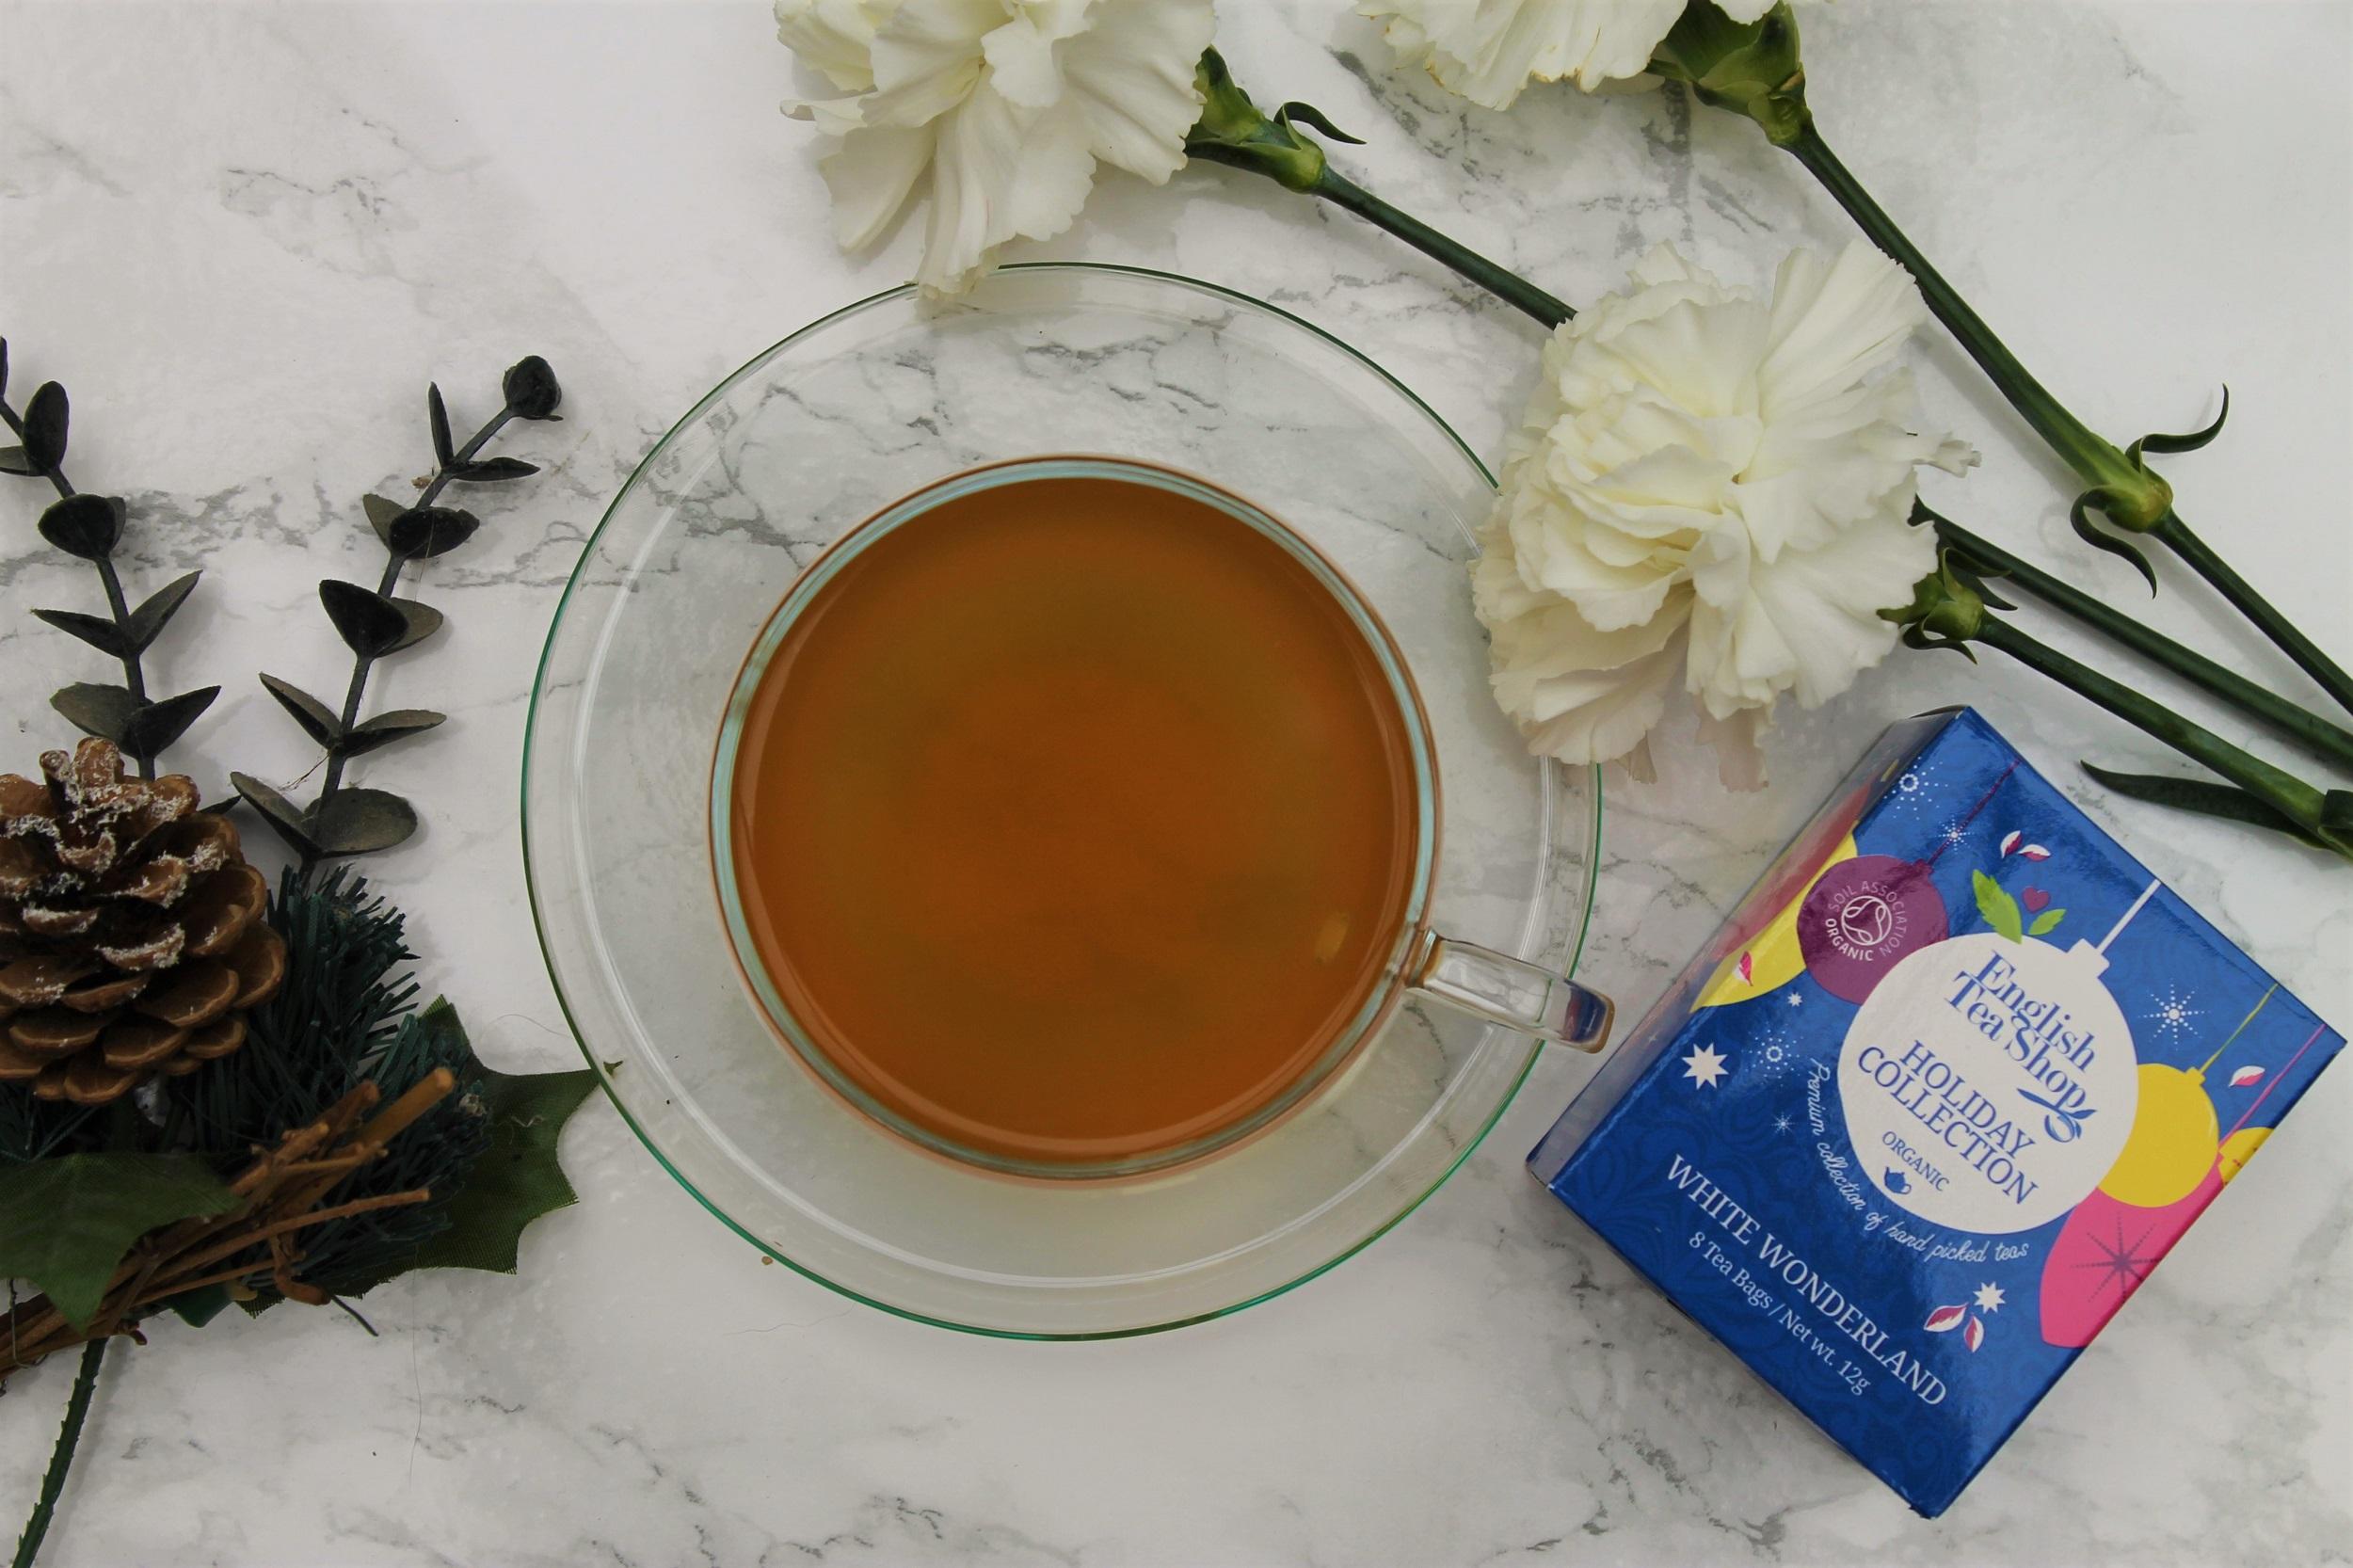 English Tea Shop White Wonderland Tea Review